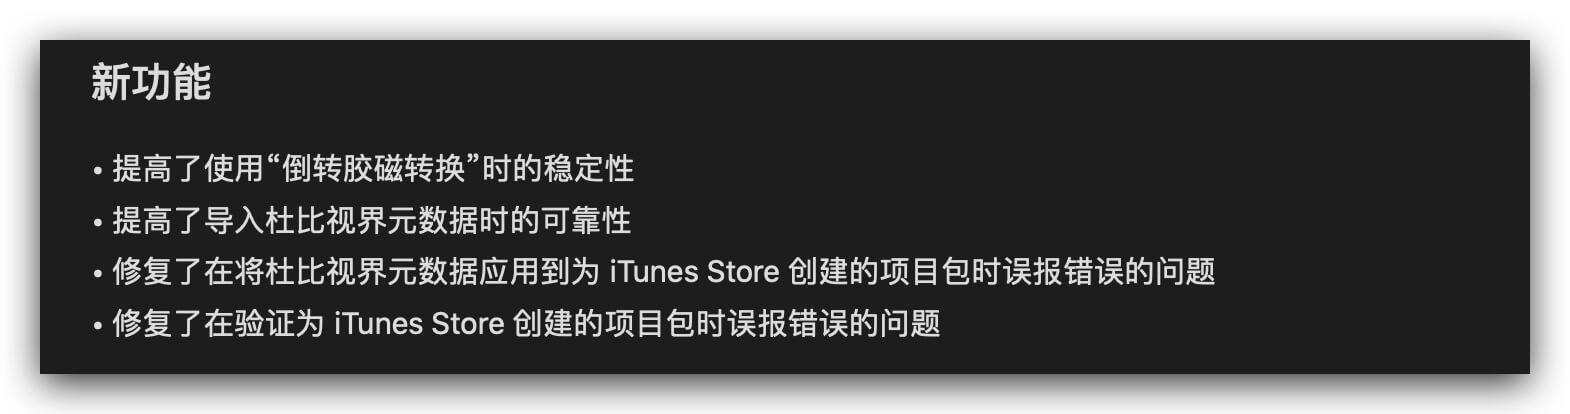 Apple Compressor 4.4.6 破解版免费下载 中英文版 苹果视频压缩编码转码输出软件